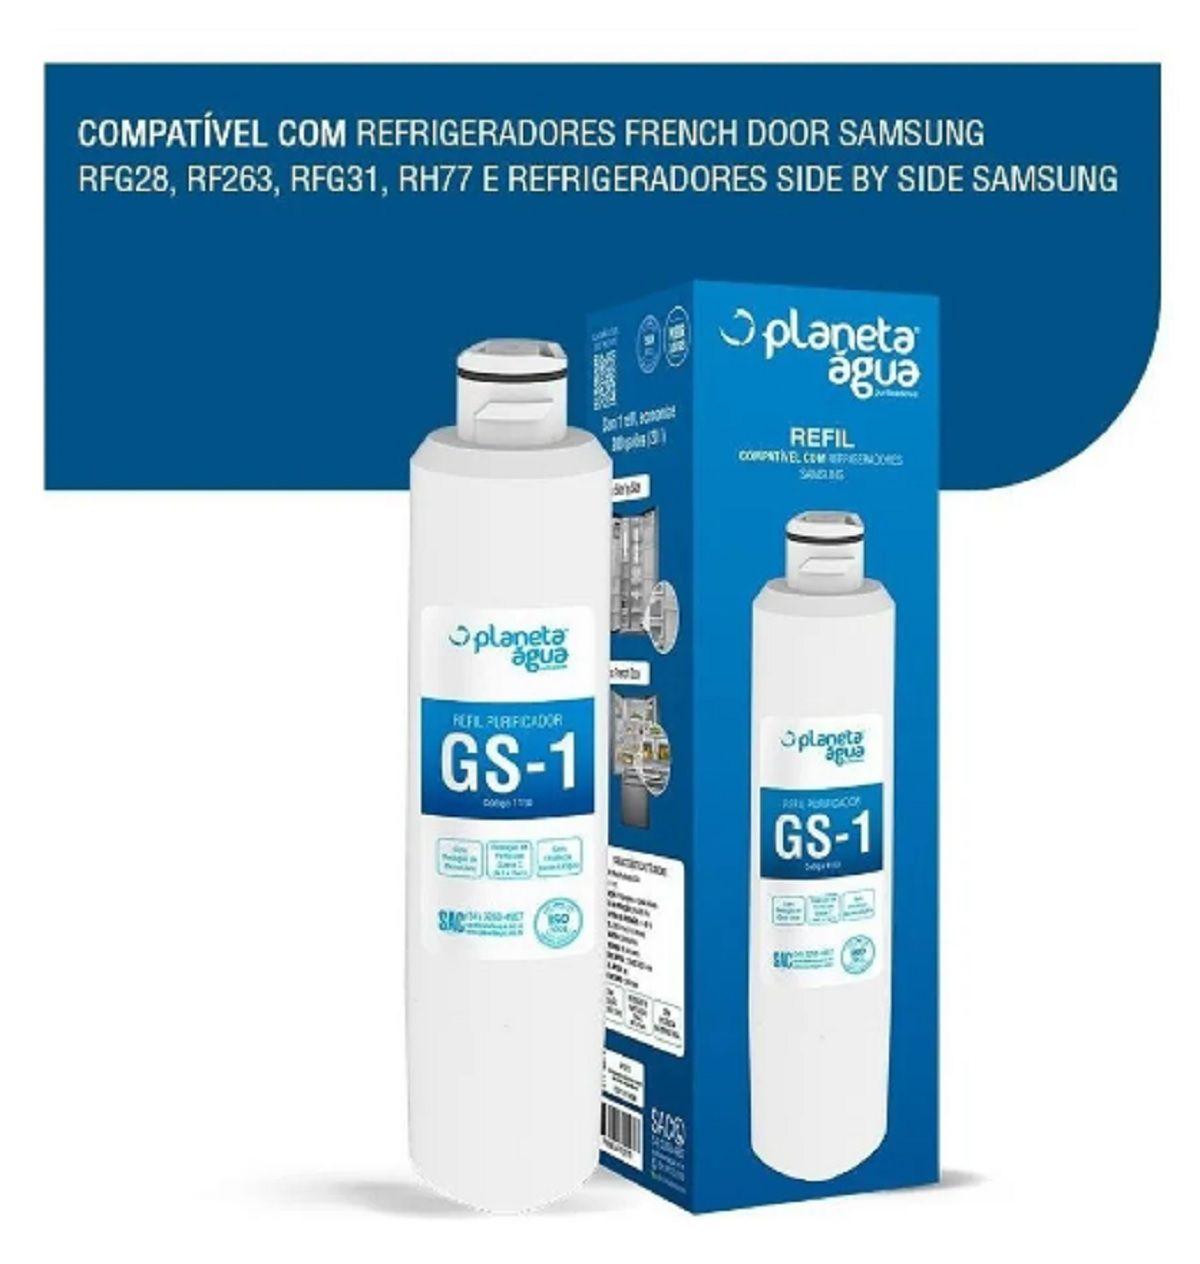 Refil Filtro Água Gs-1 Geladeira Samsung Haf-cin/exp Da29-00020b Haf-cin/xme Rf28hdedbsr